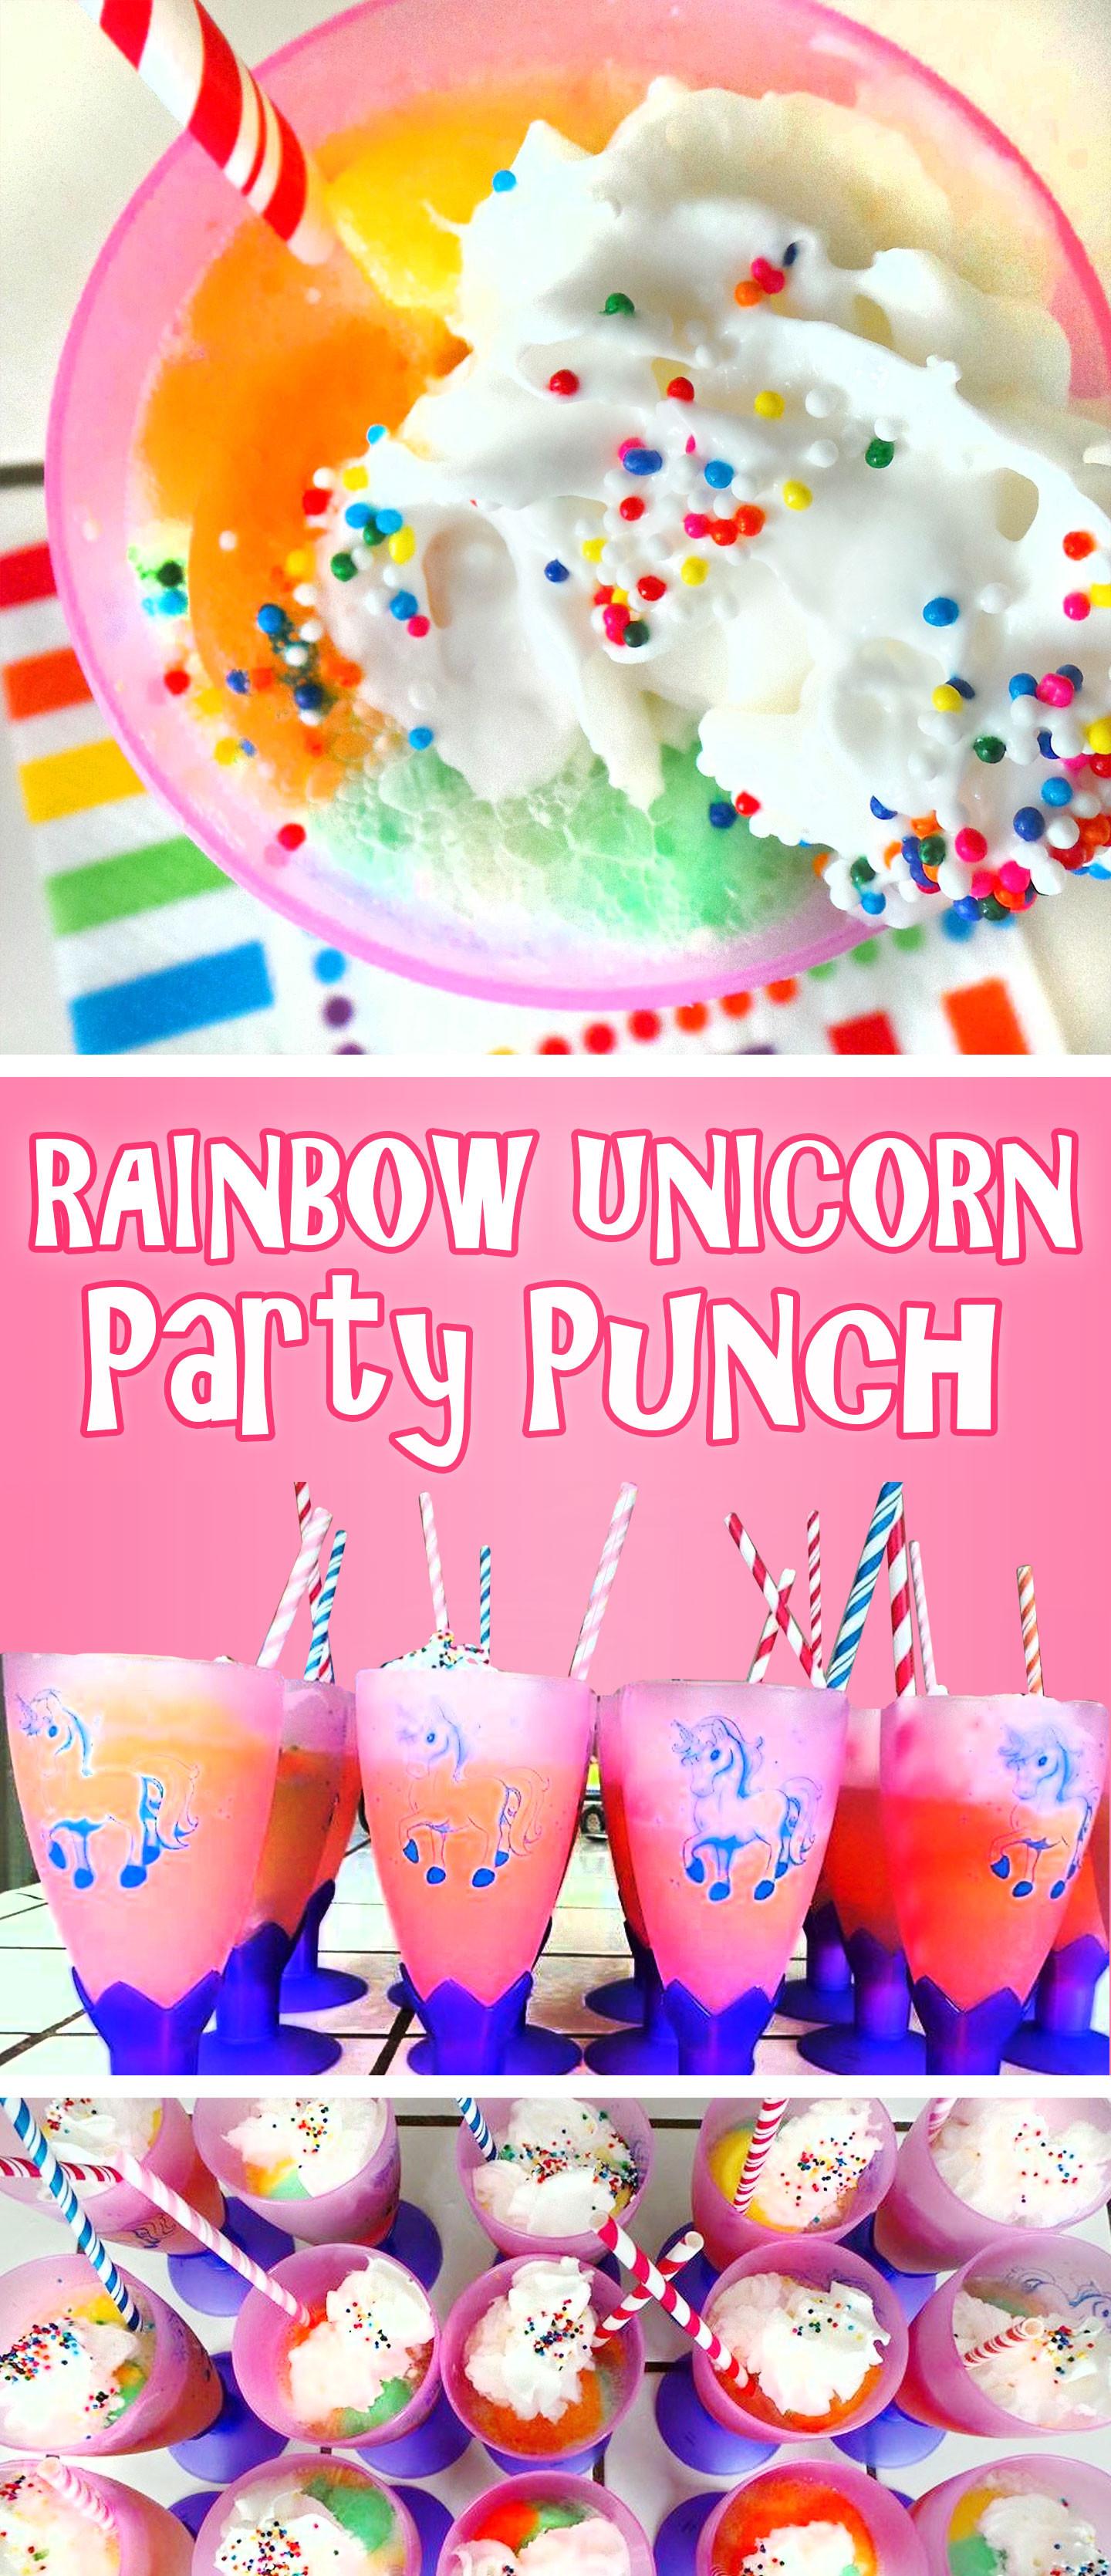 Rainbow And Unicorn Party Ideas  Rainbow Unicorn Party Punch